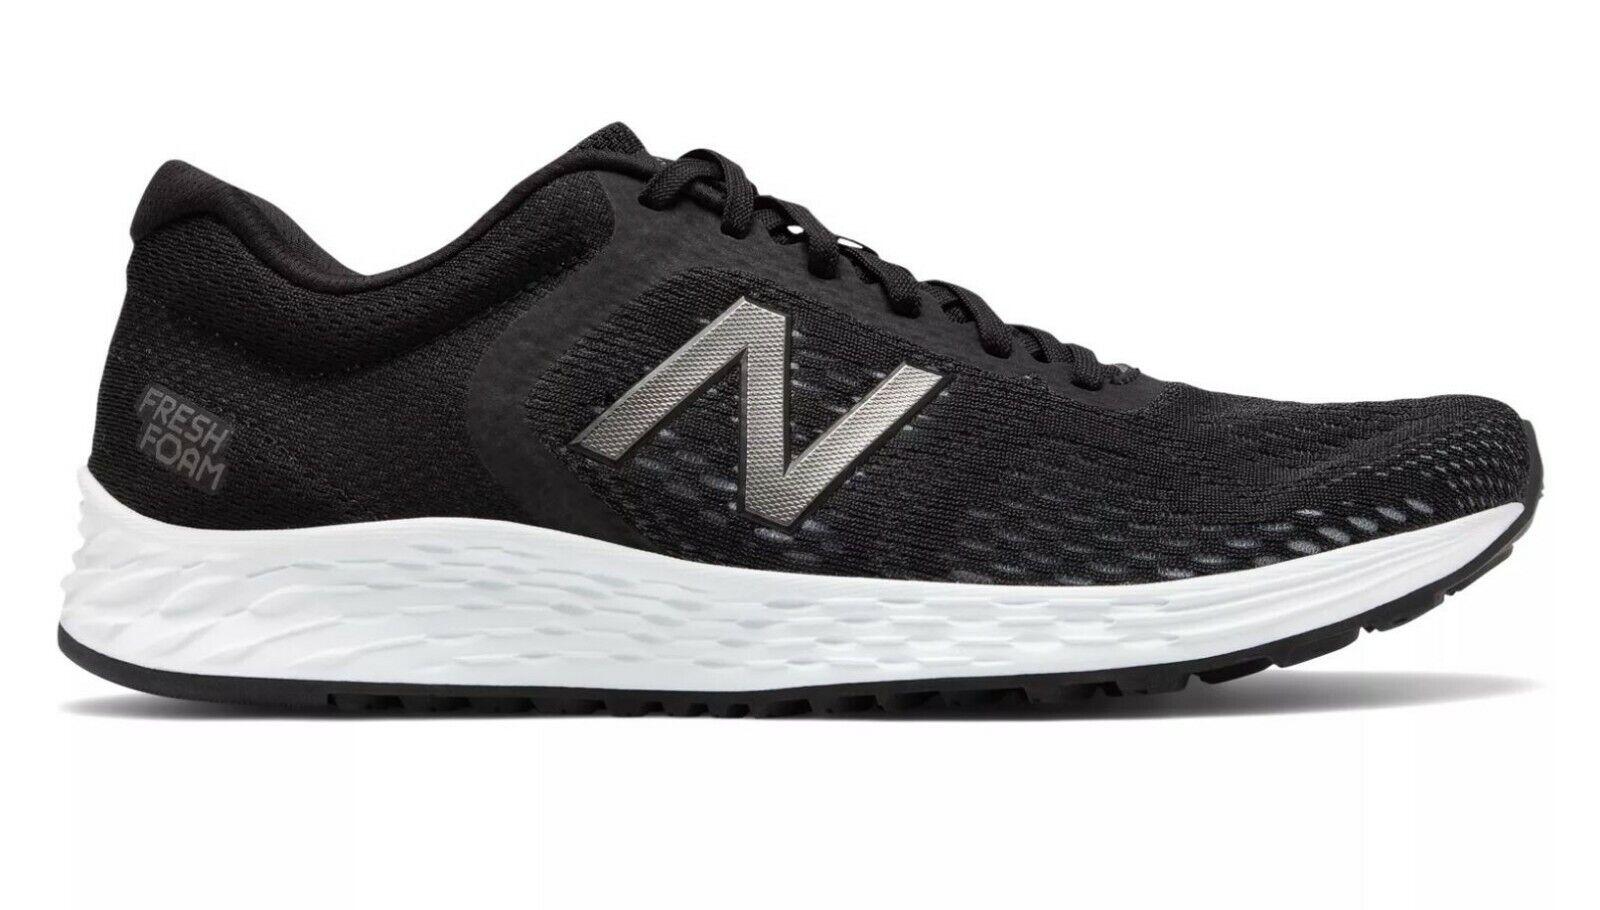 LATEST RELEASE New Balance Arishi Mens Running shoes (2E) (MARISLB2)